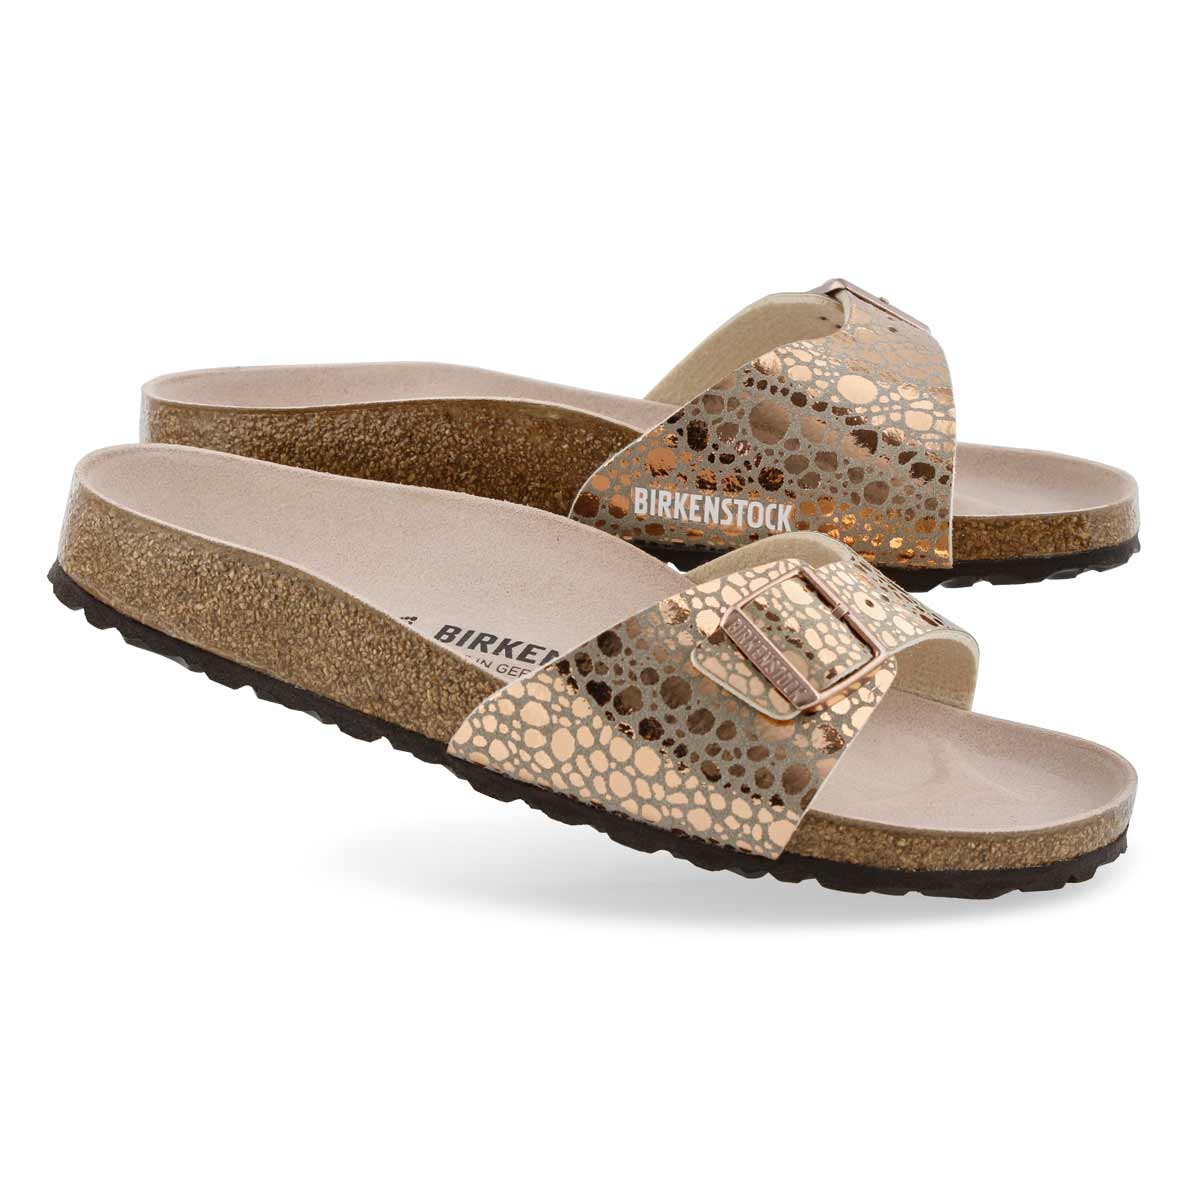 Lds Madrid BF mtlc cpr 1 strap sandal- N